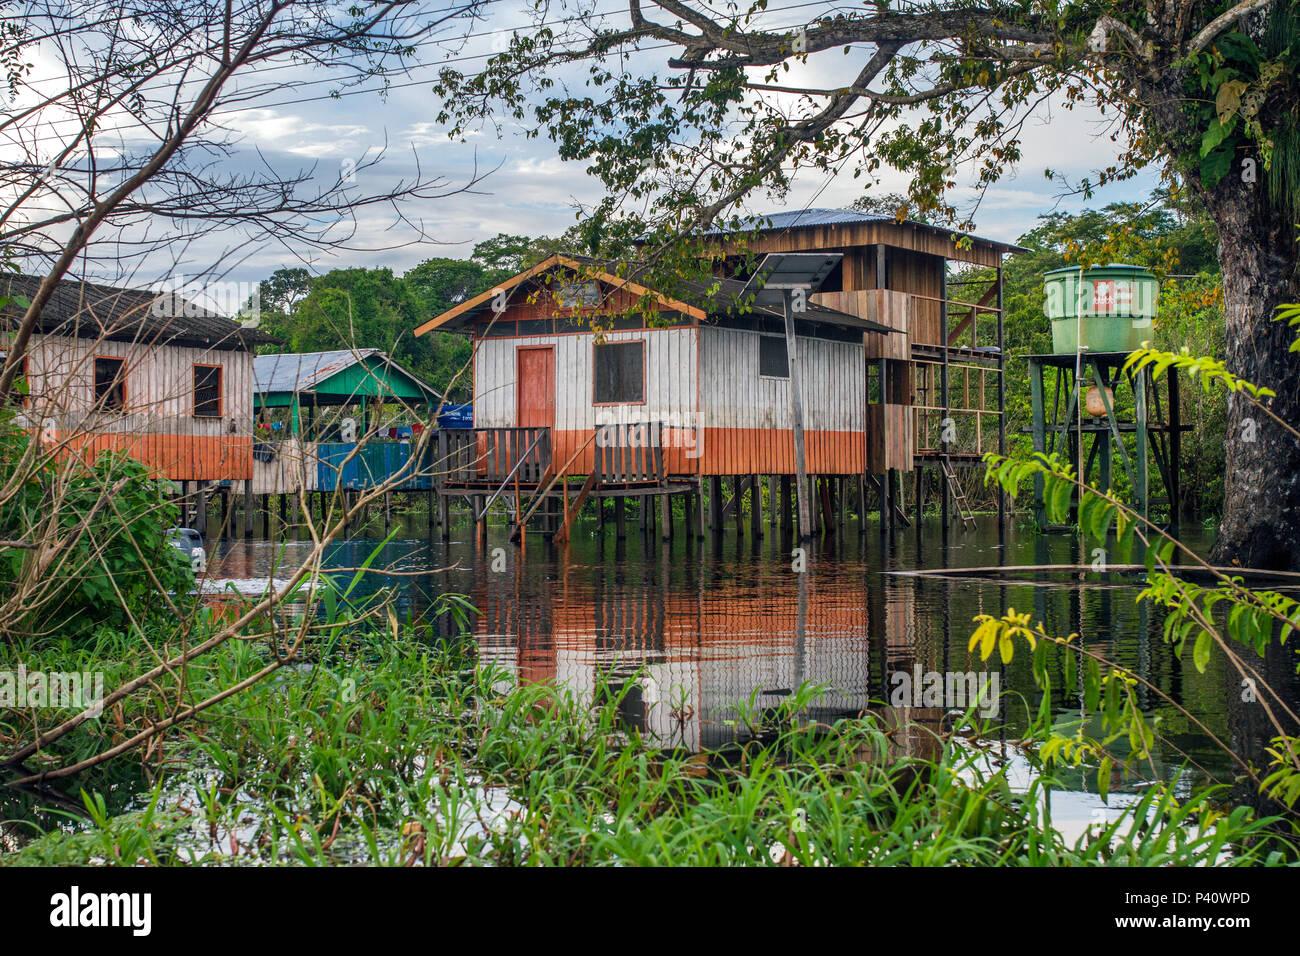 Uarini Amazonas fonte: c8.alamy.com